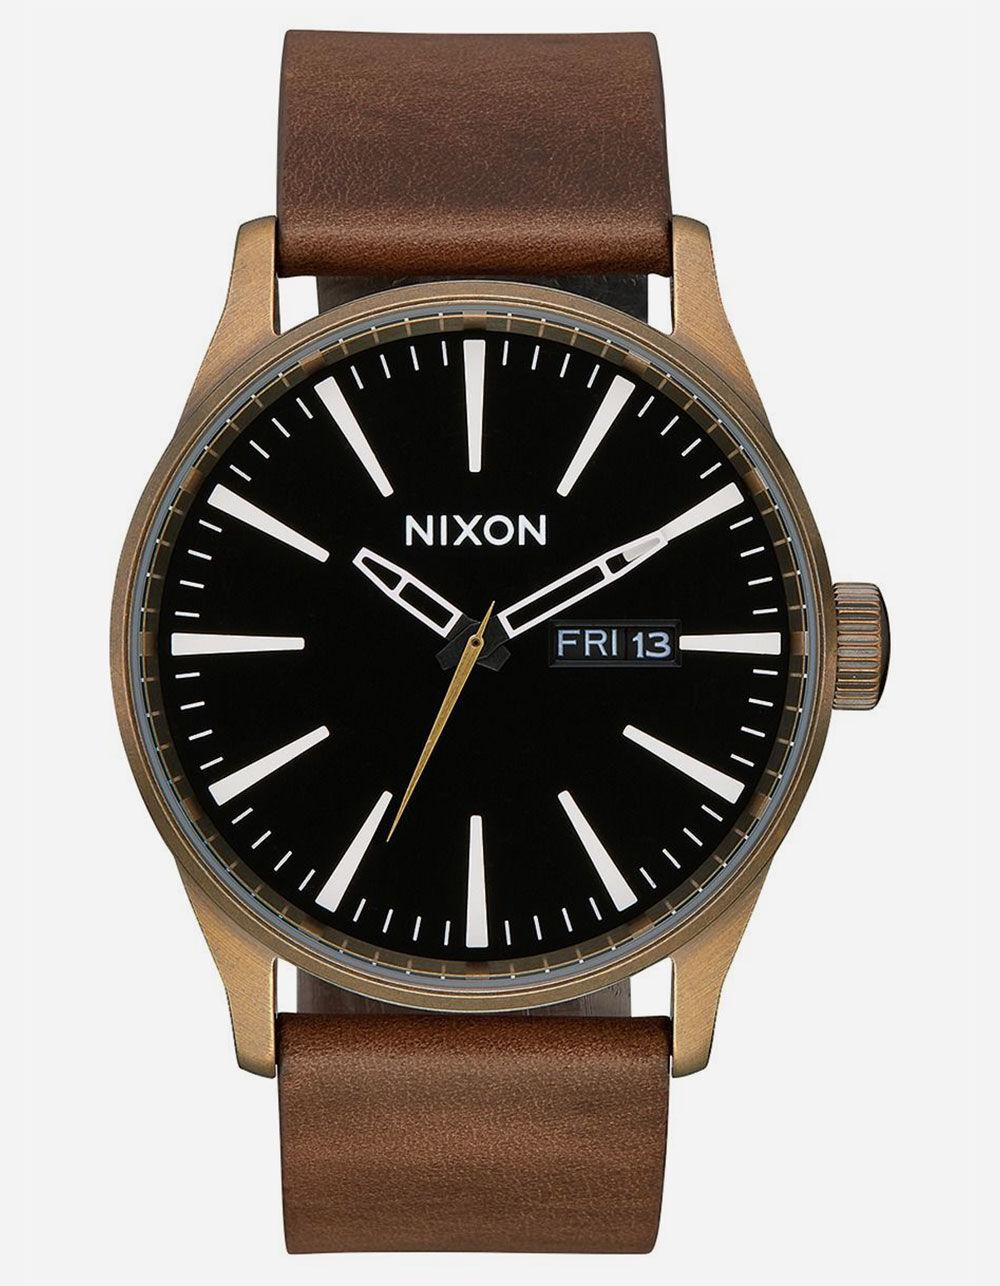 NIXON Raising The Bar Sentry Leather Black & Brown Watch